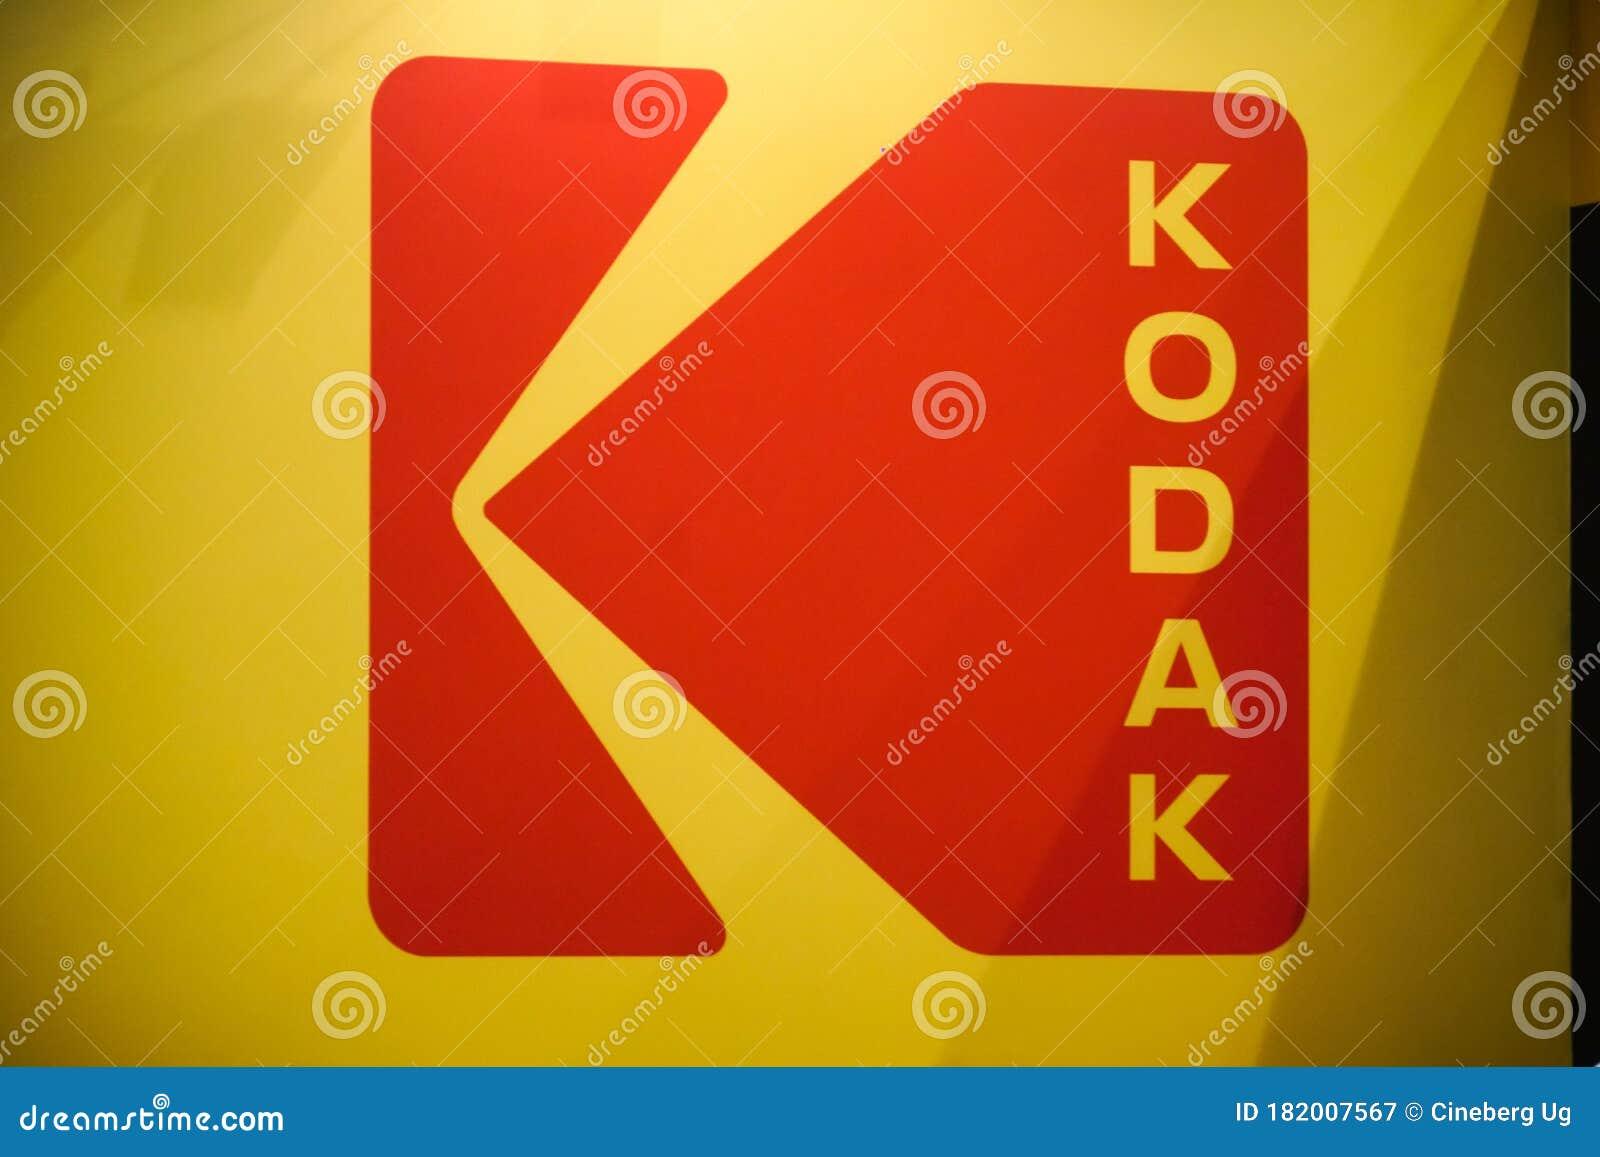 Kodak Emblem Editorial Photography Image Of Technology 182007567